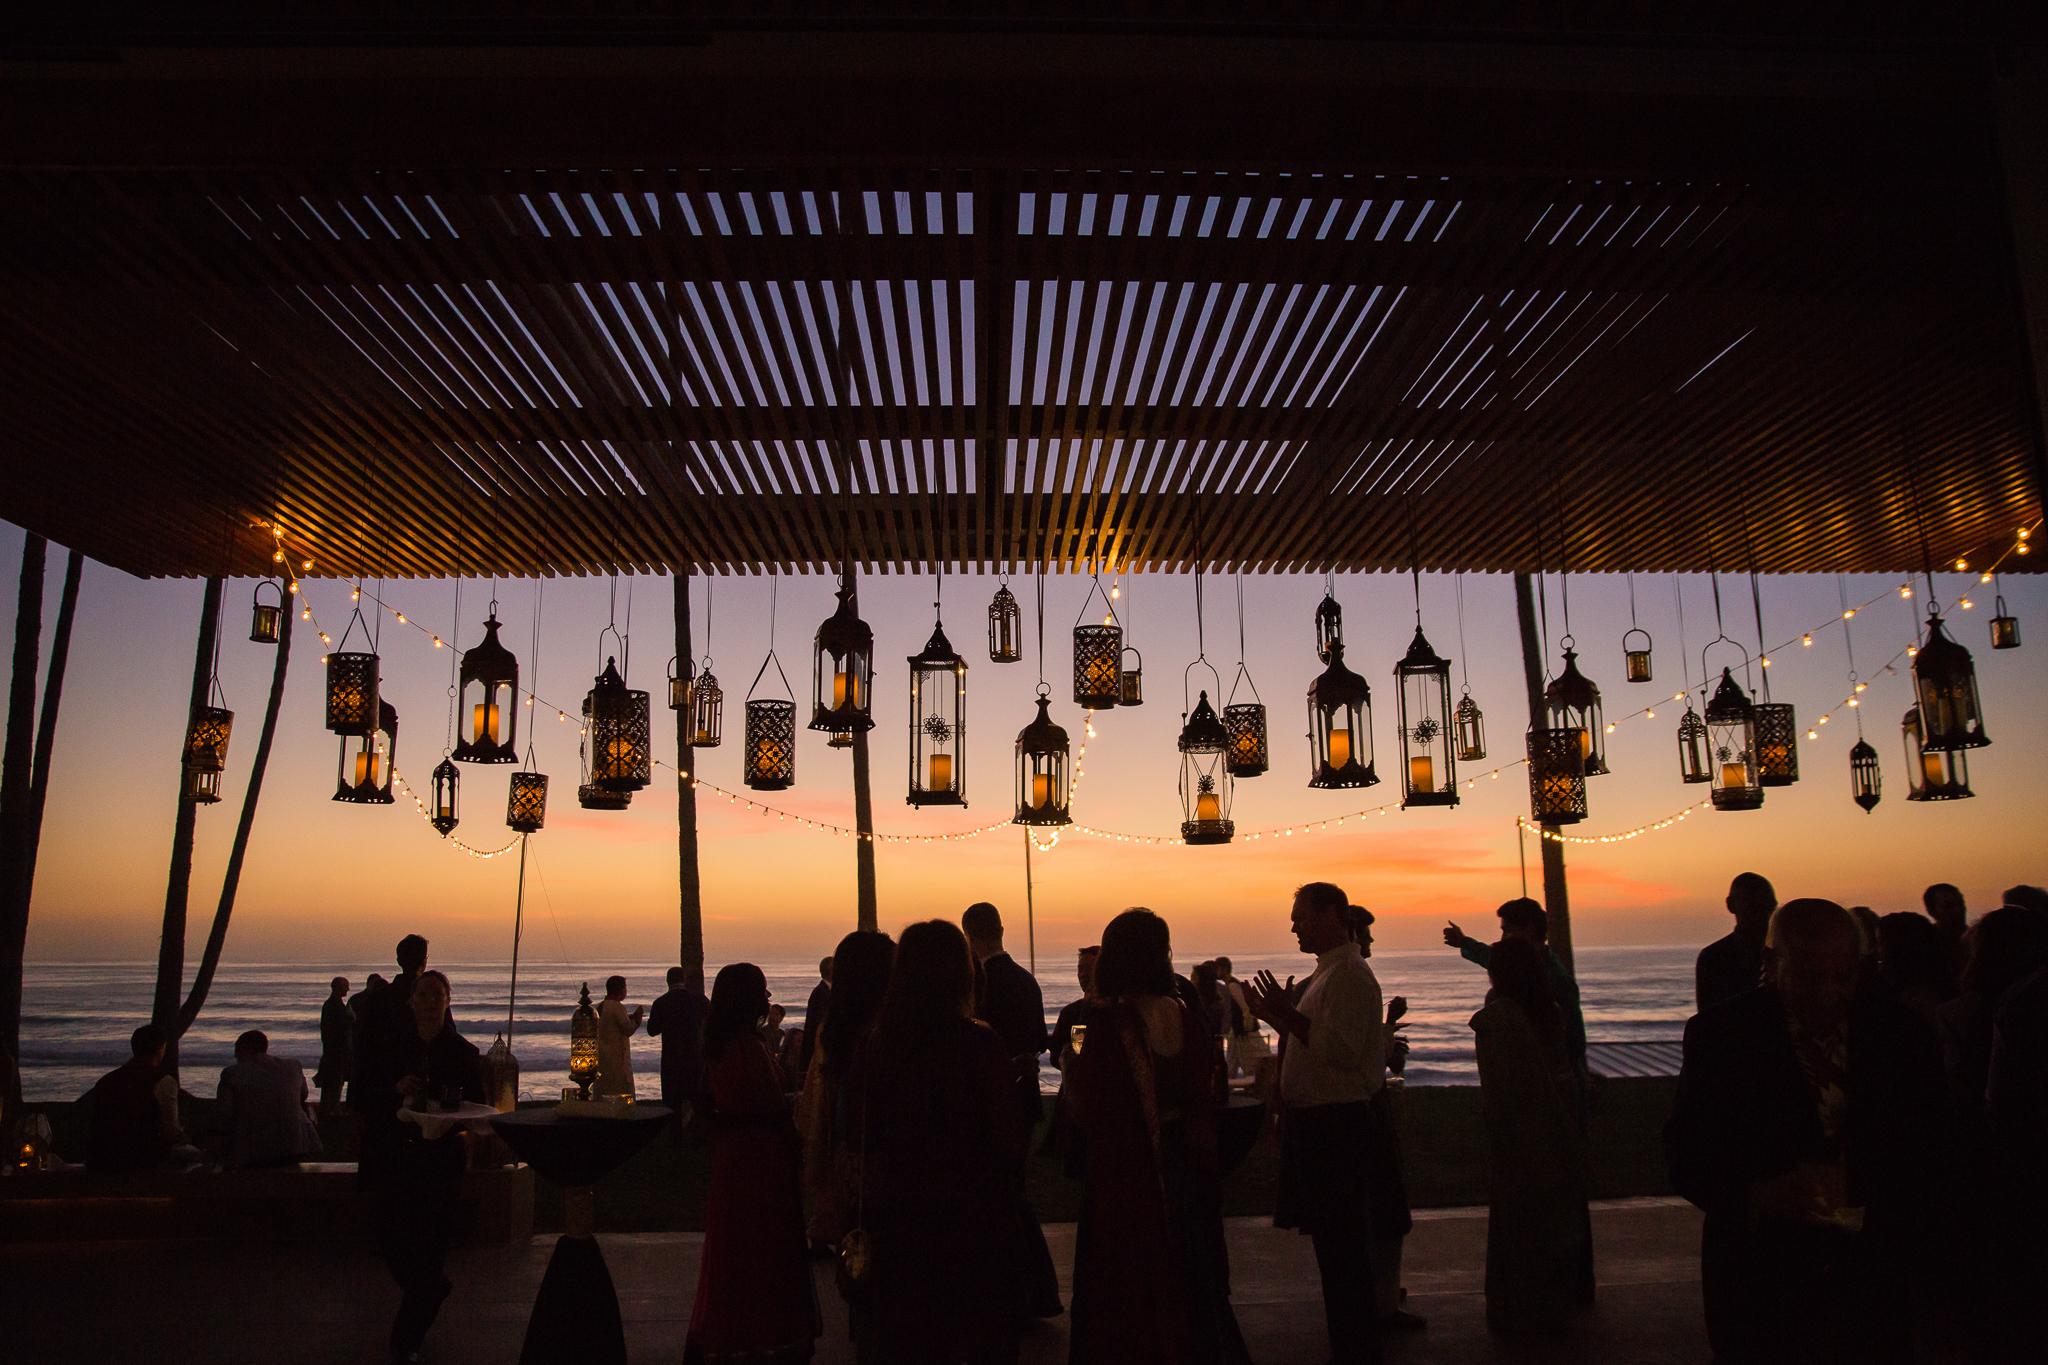 Beautiful sunset with hanging lanterns